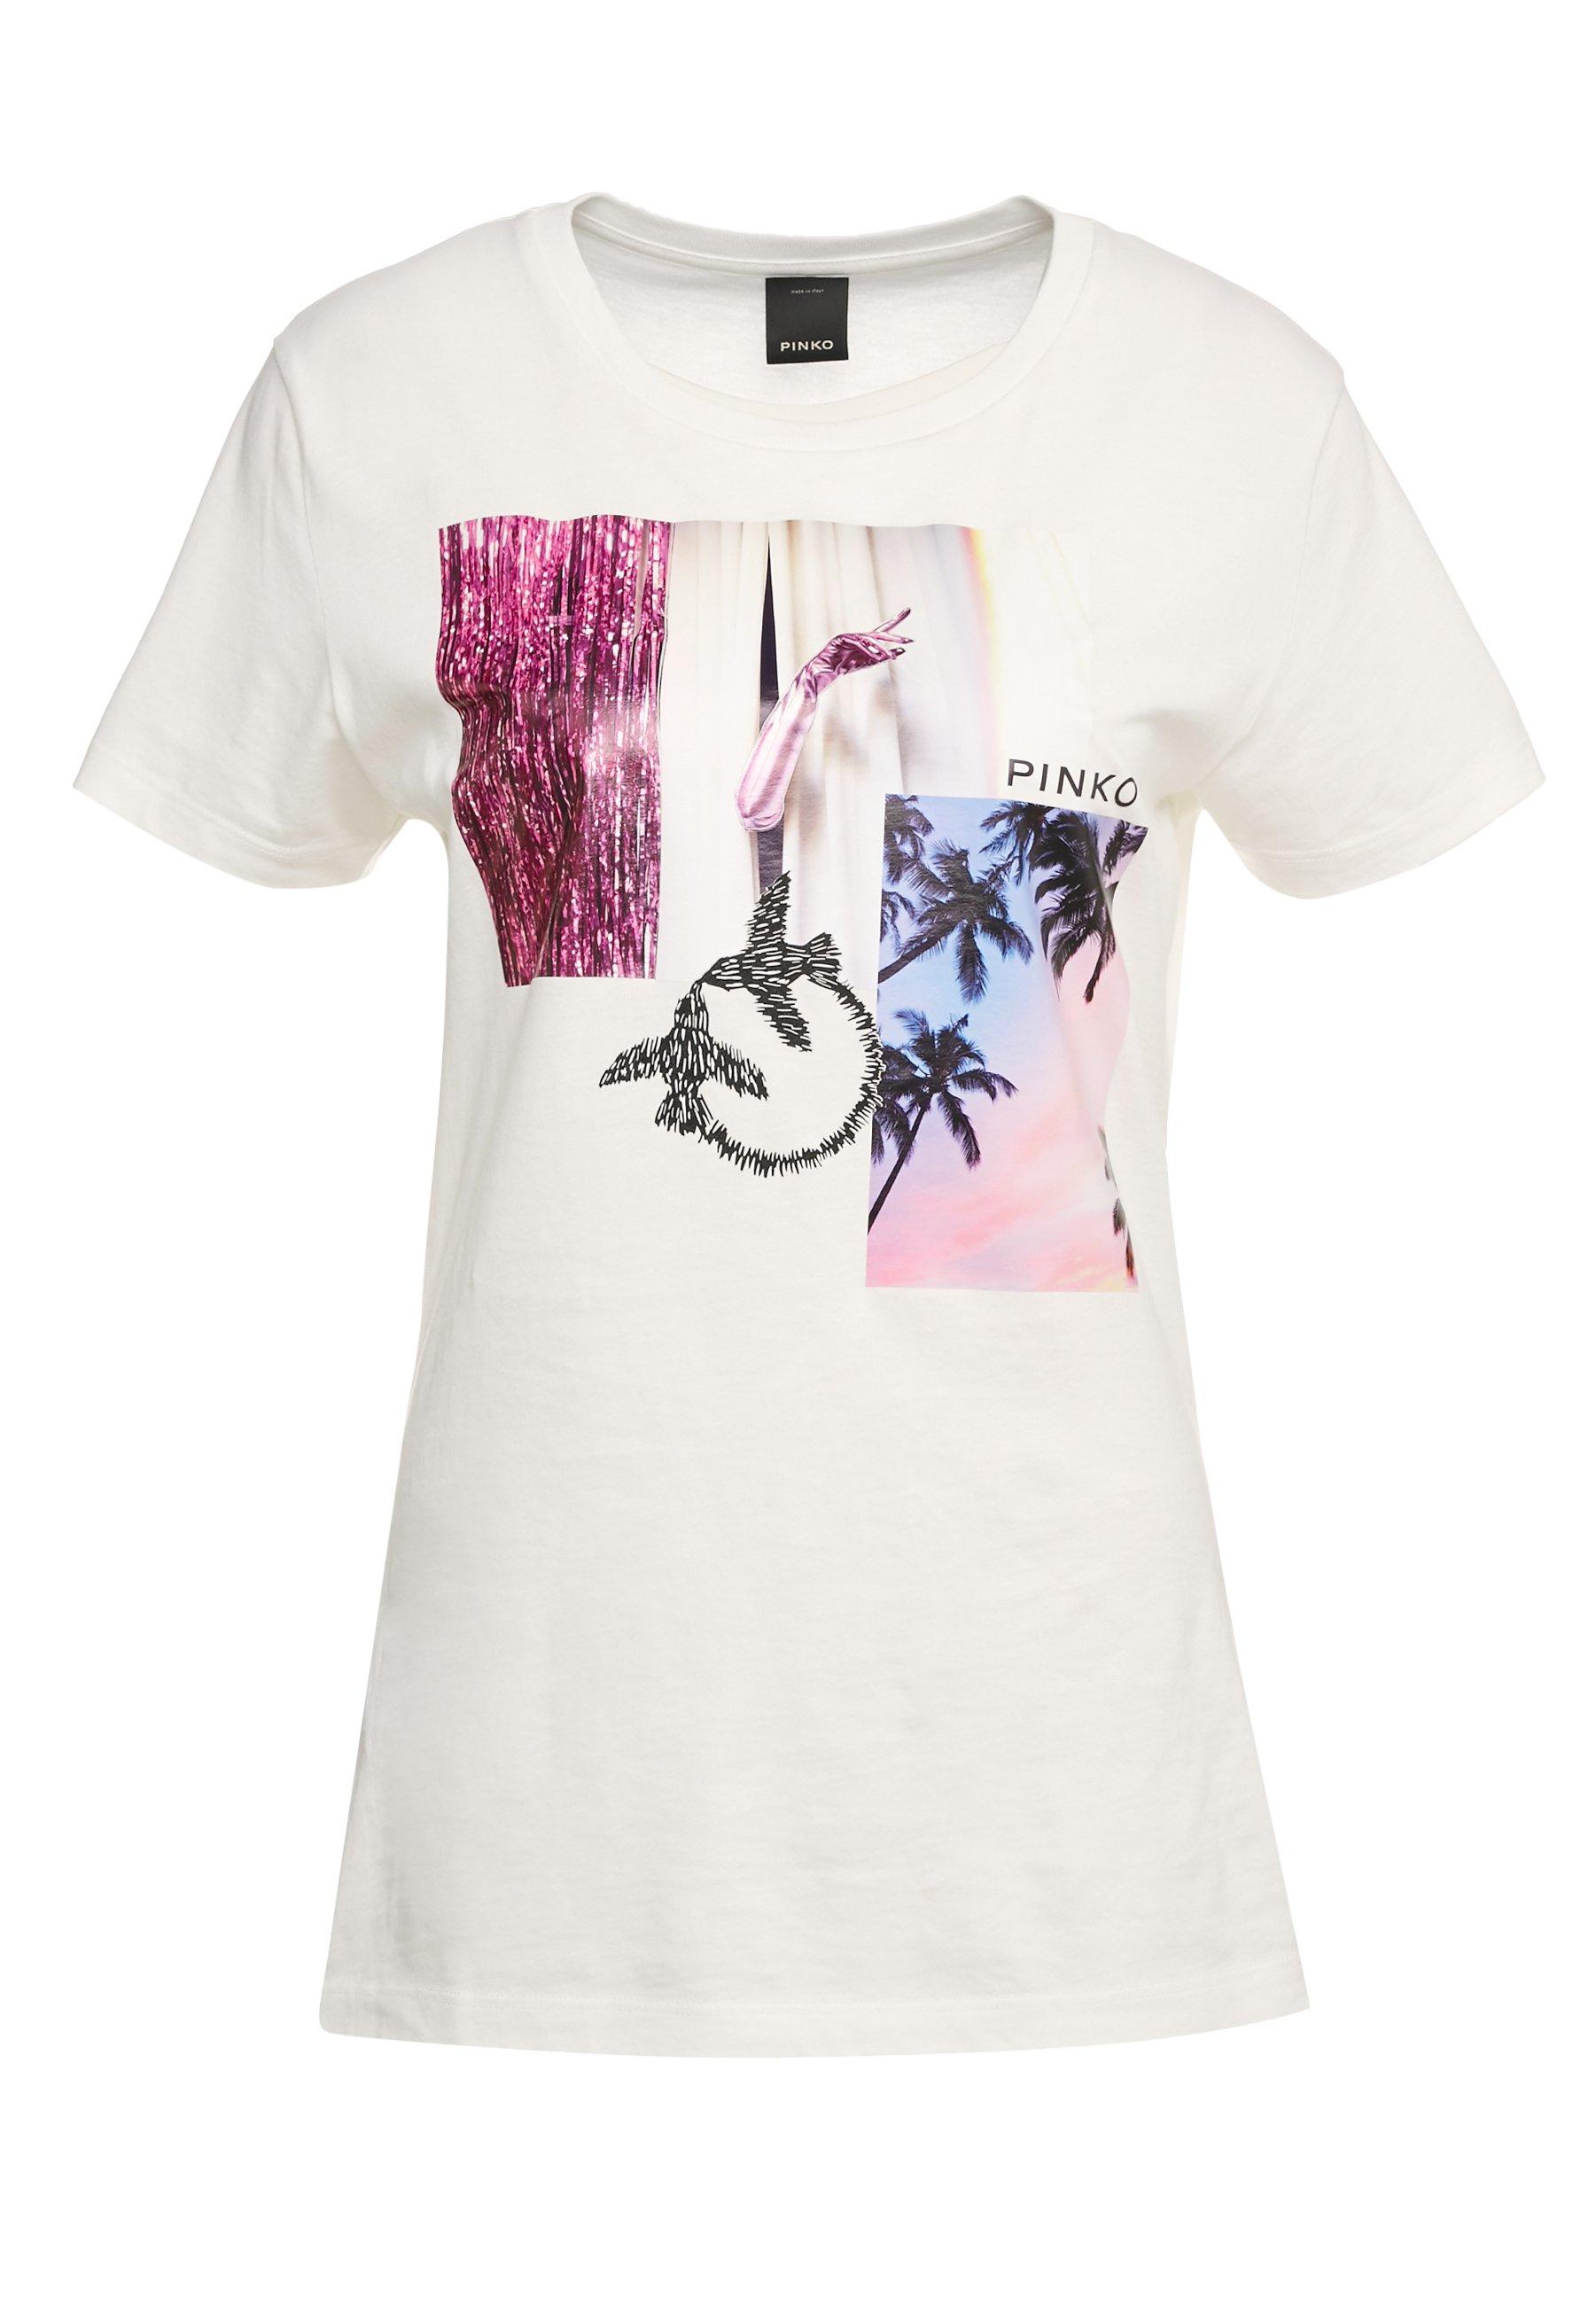 Pinko Scones - T-shirt Con Stampa Bianco PcxNCQk